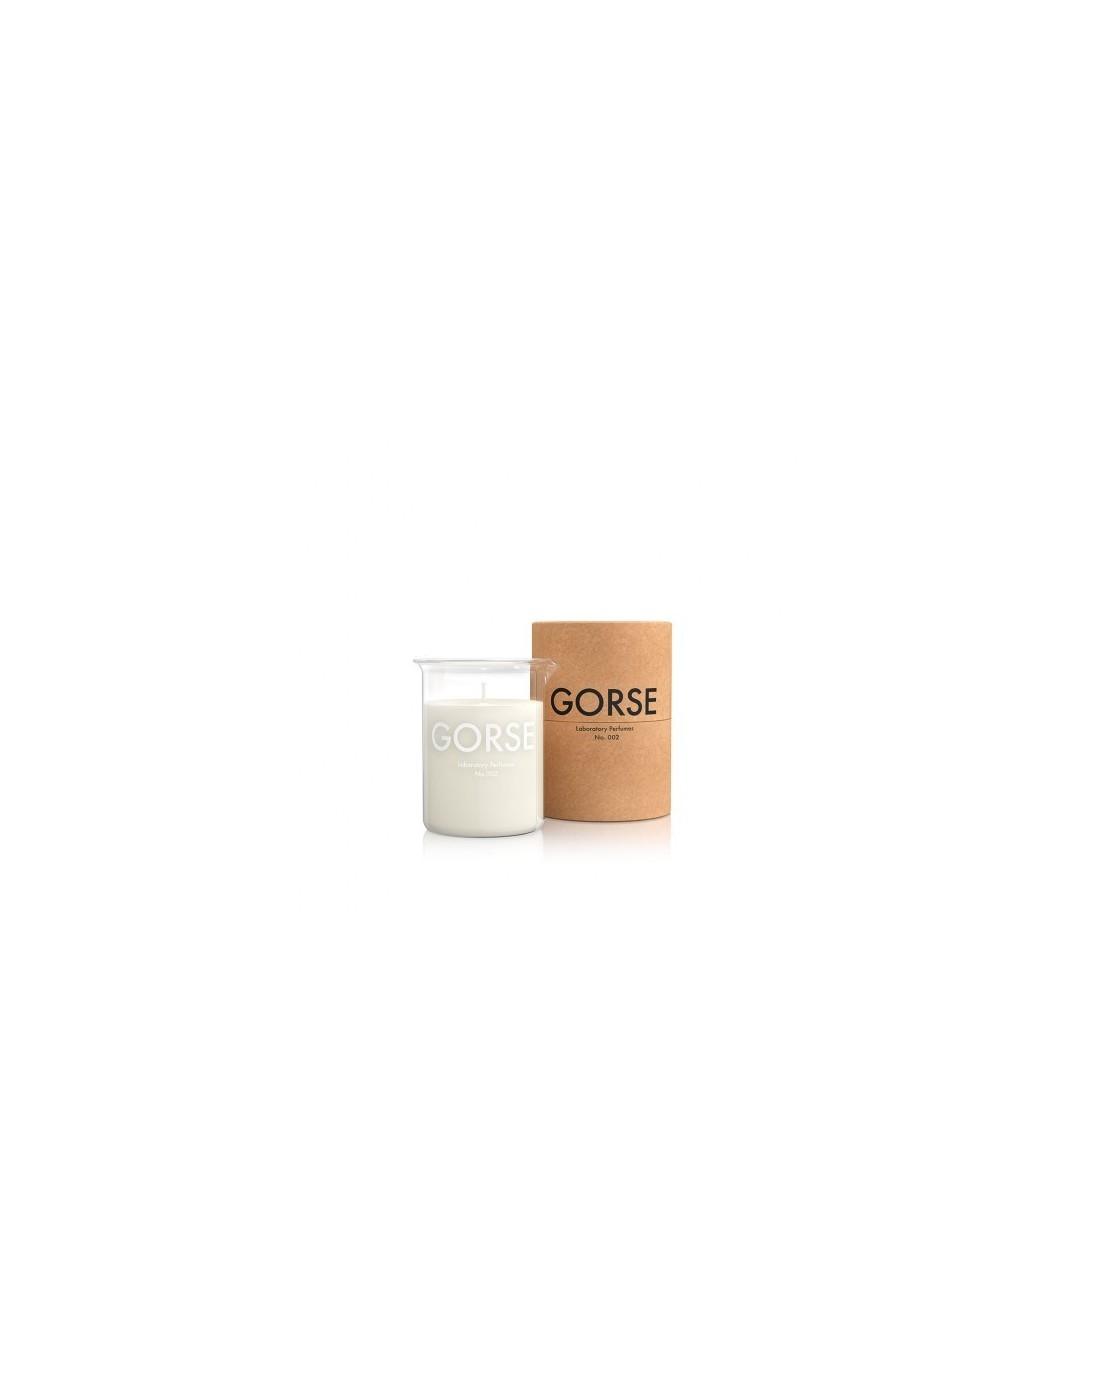 LaboratoryÊ Perfumes Gorse Candela 200g  5060385330029